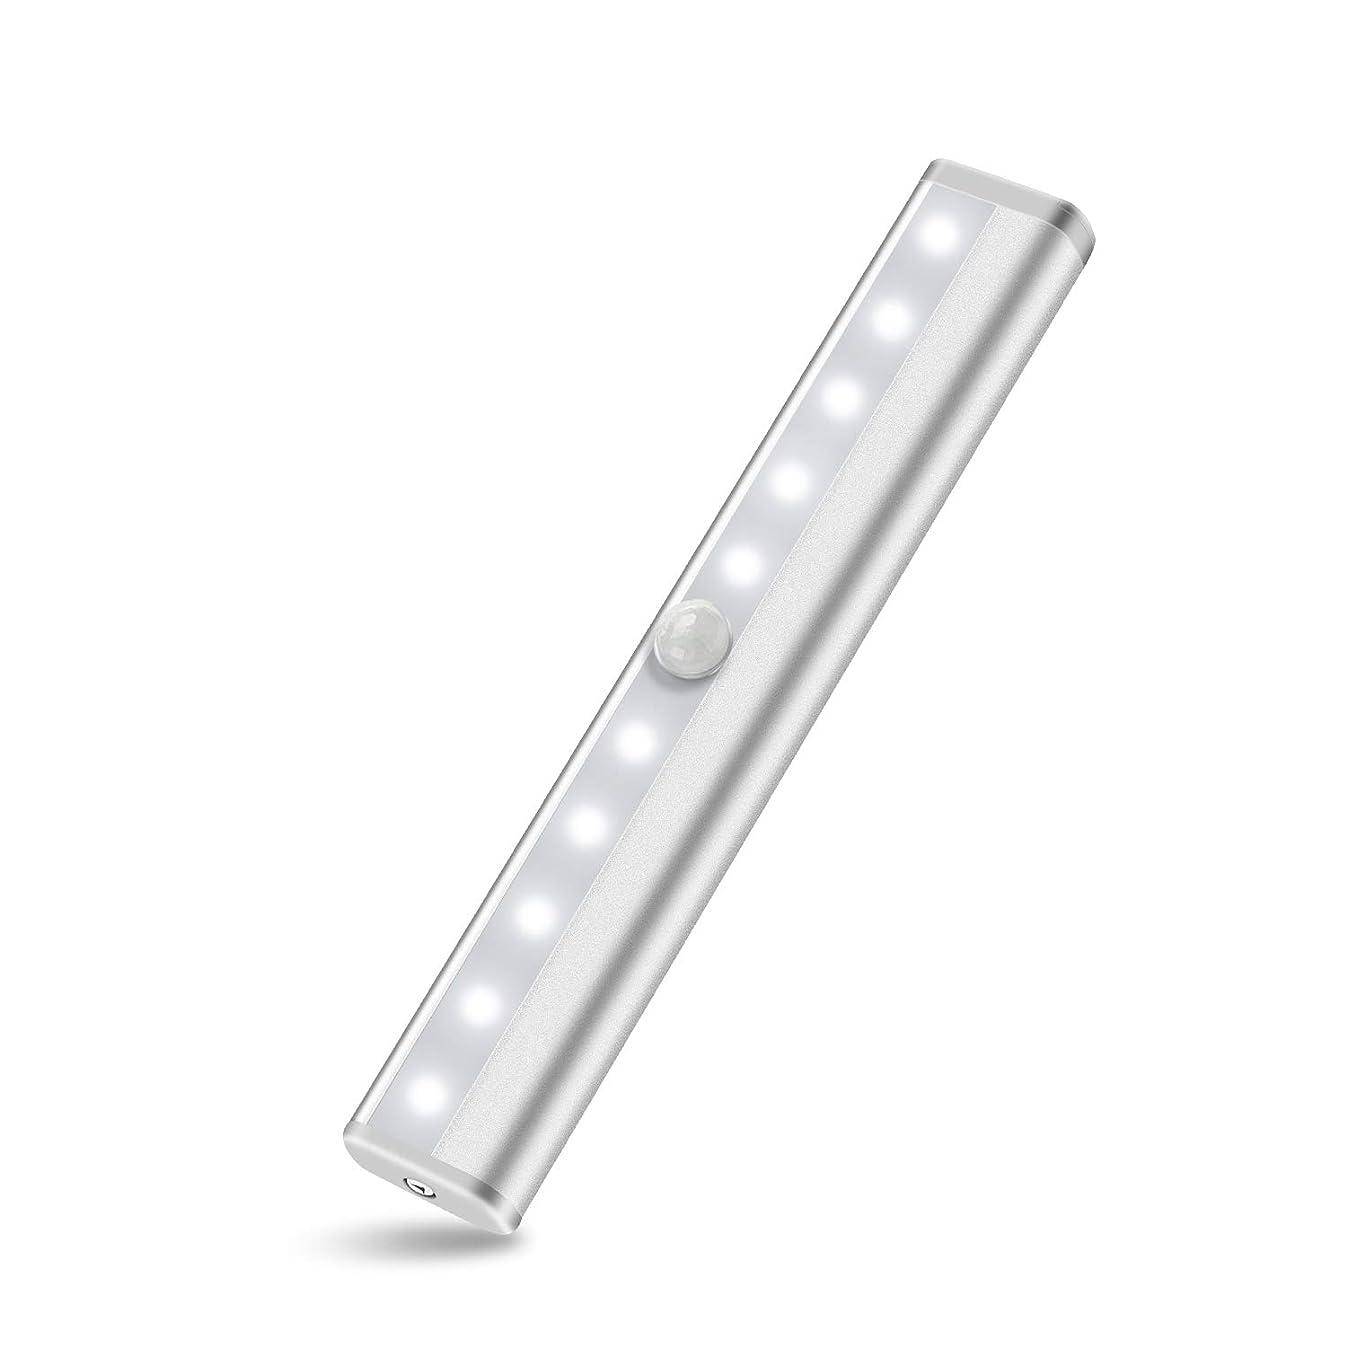 Anbock LED Closet Light Motion Sensor Wireless Light Under Cabinet Lighting Battery Powered Night Light Sensing Activated Stairway Pantry Wardrobe Kitchen Hallway Bathroom 6000K